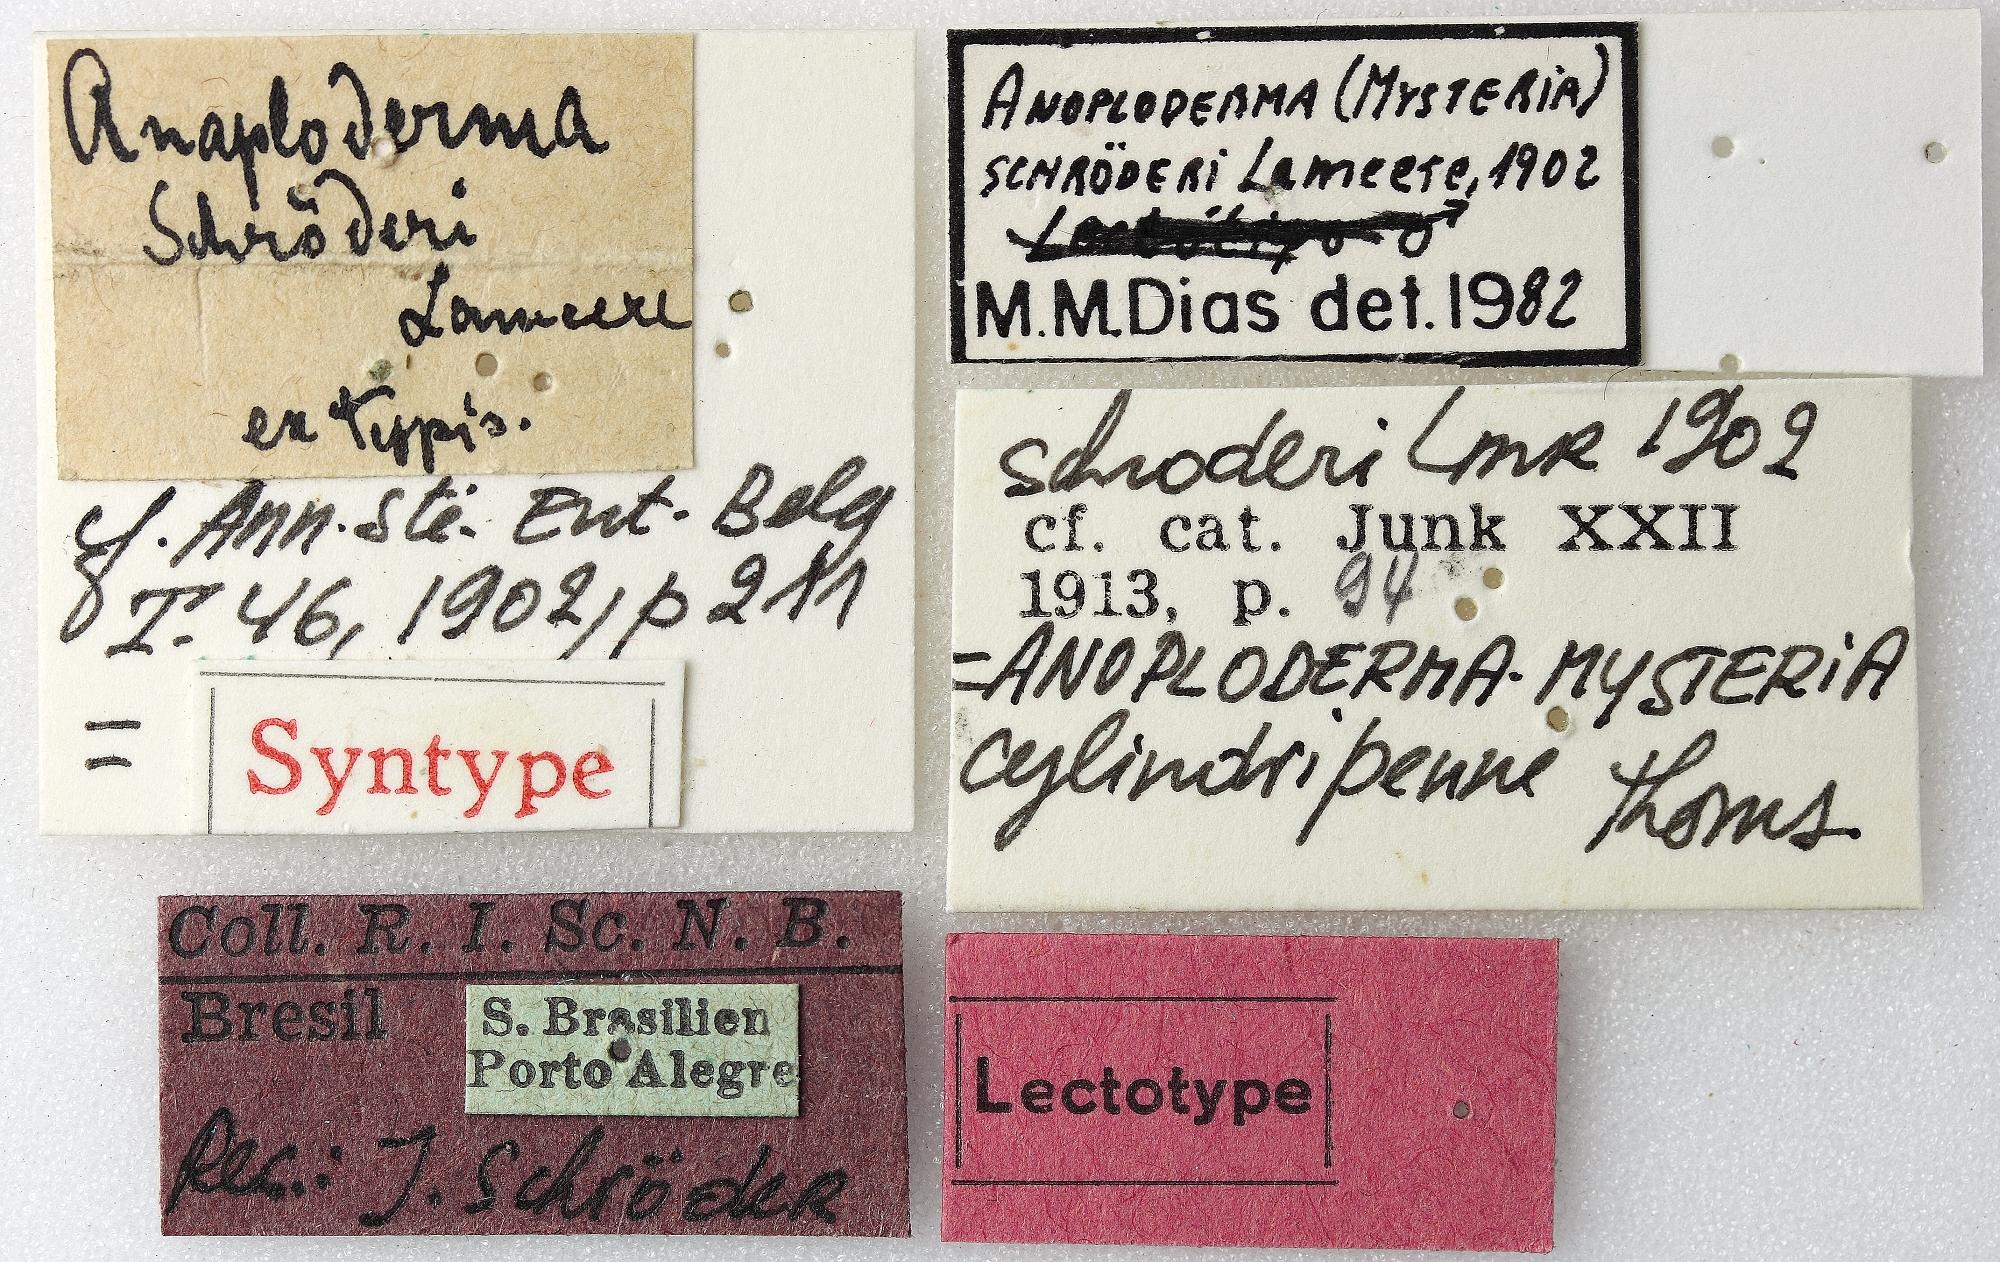 Anoploderma (Mysteria) schroderi 03 00 Lectotype F 023 BRUS 201405.jpg